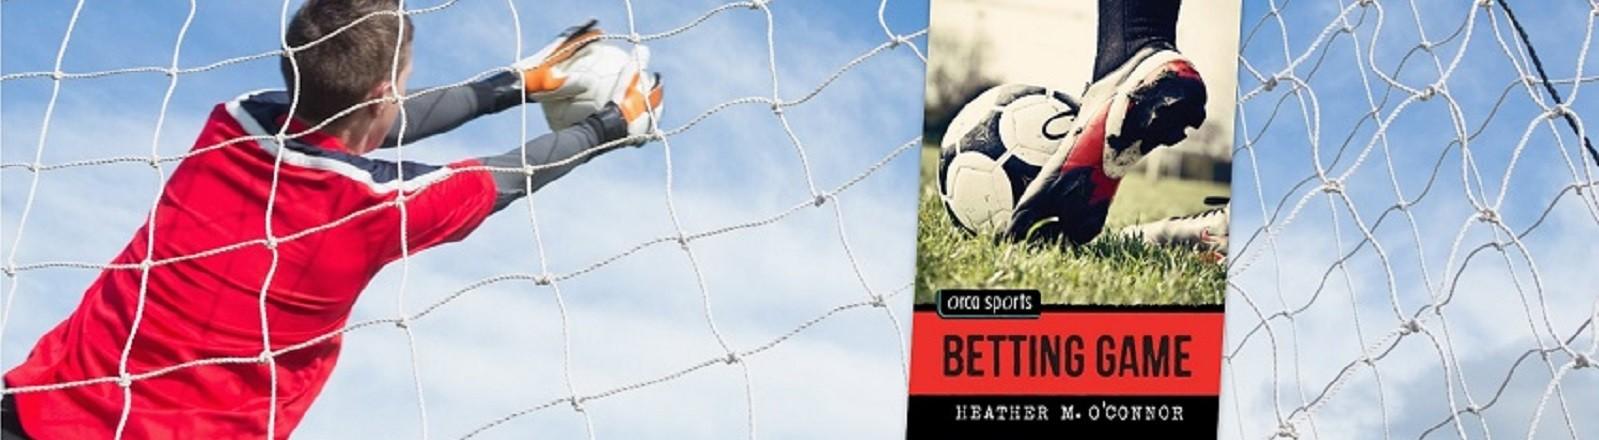 website header soccer goalie and Betting Game